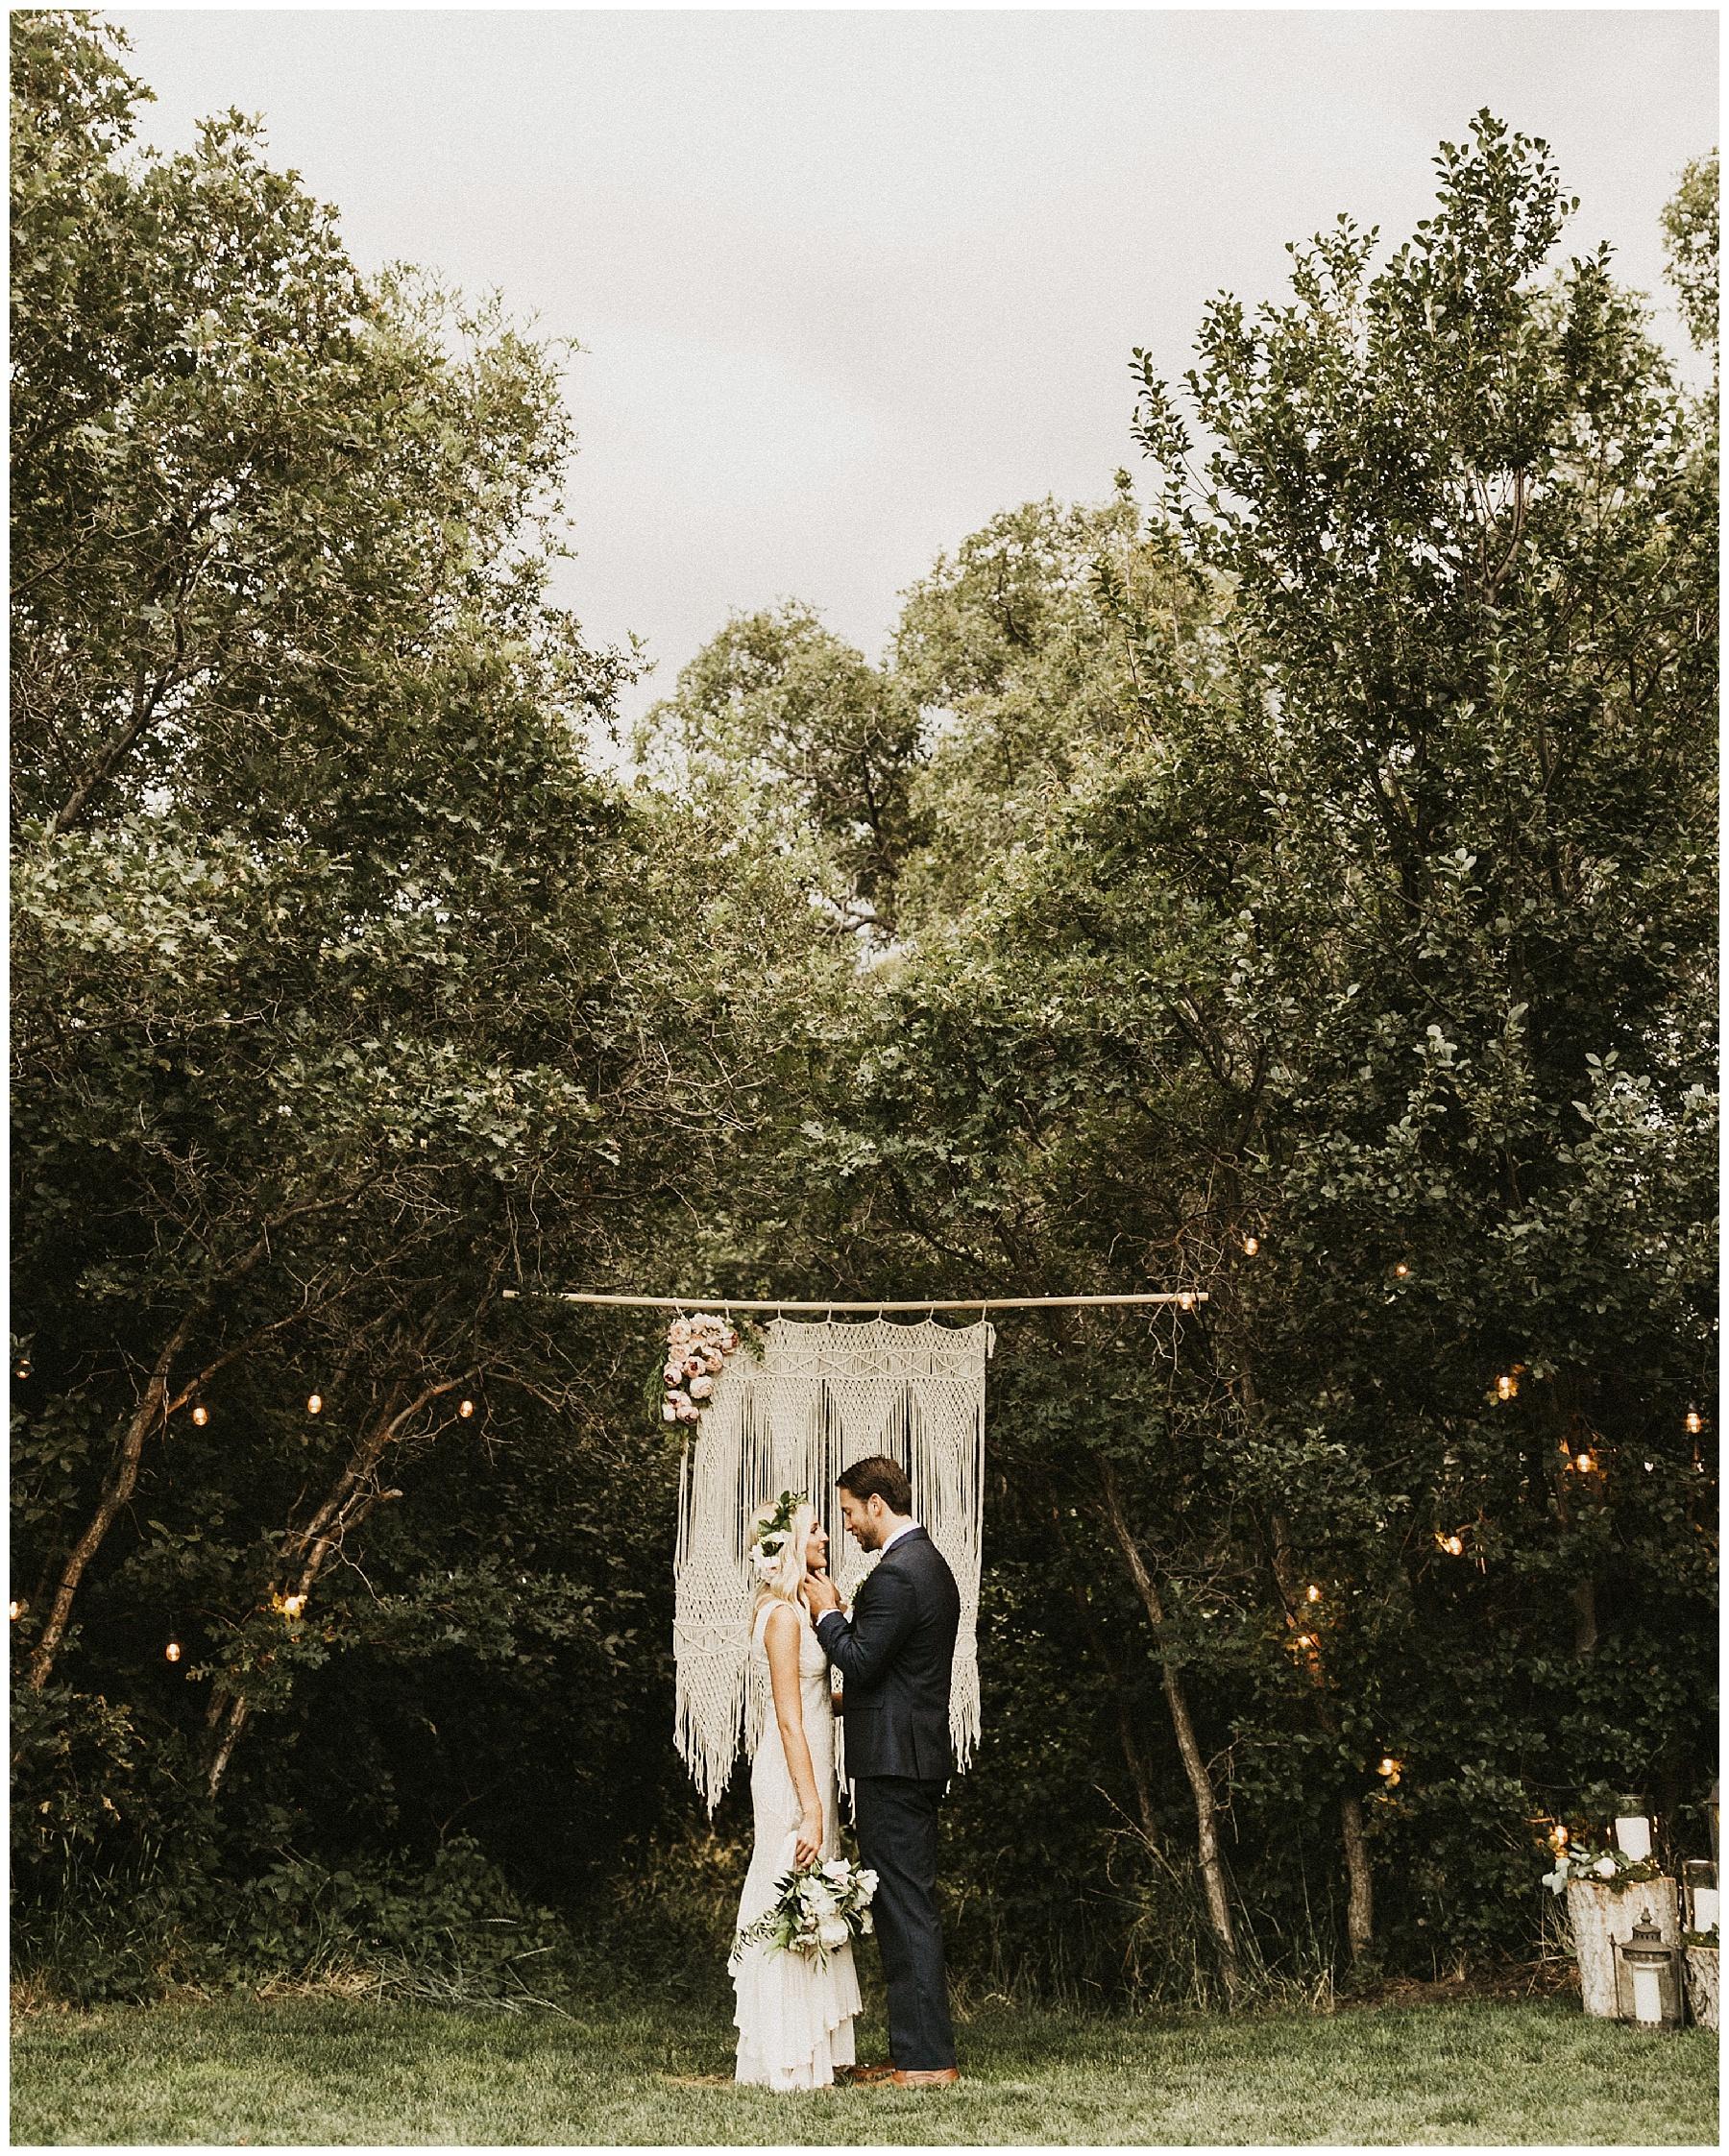 Intimate Backyard Barbeque Wedding